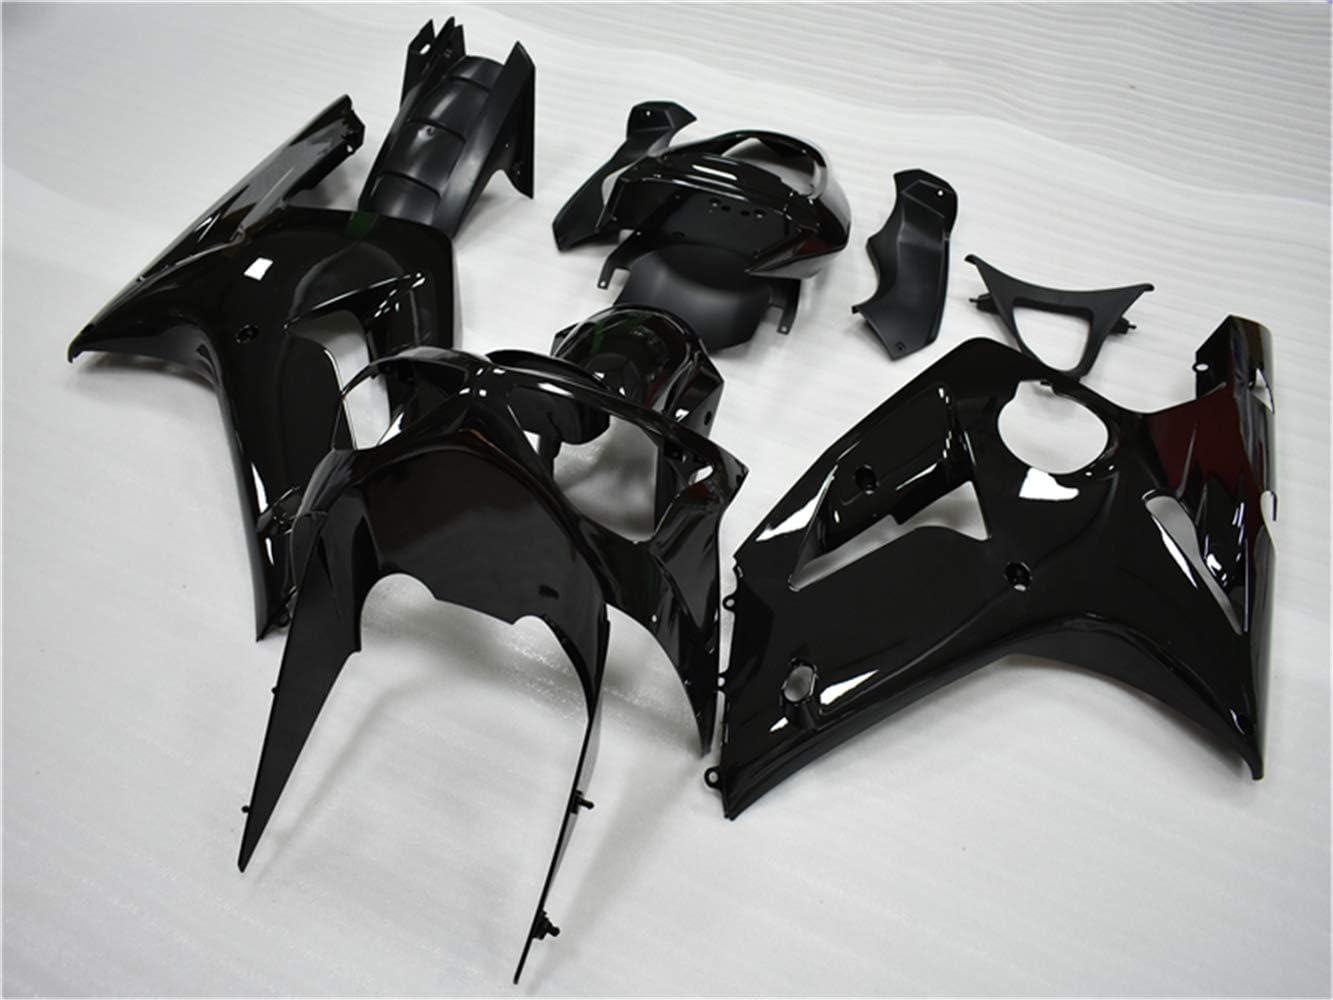 NT FAIRING Glossy Black Fairing Fit for KAWASAKI NINJA 2003 2004 ZX6R 636 New Injection Mold ABS Plastics Bodywork Body Kit Bodyframe Body Work 03 04 ZX-6R